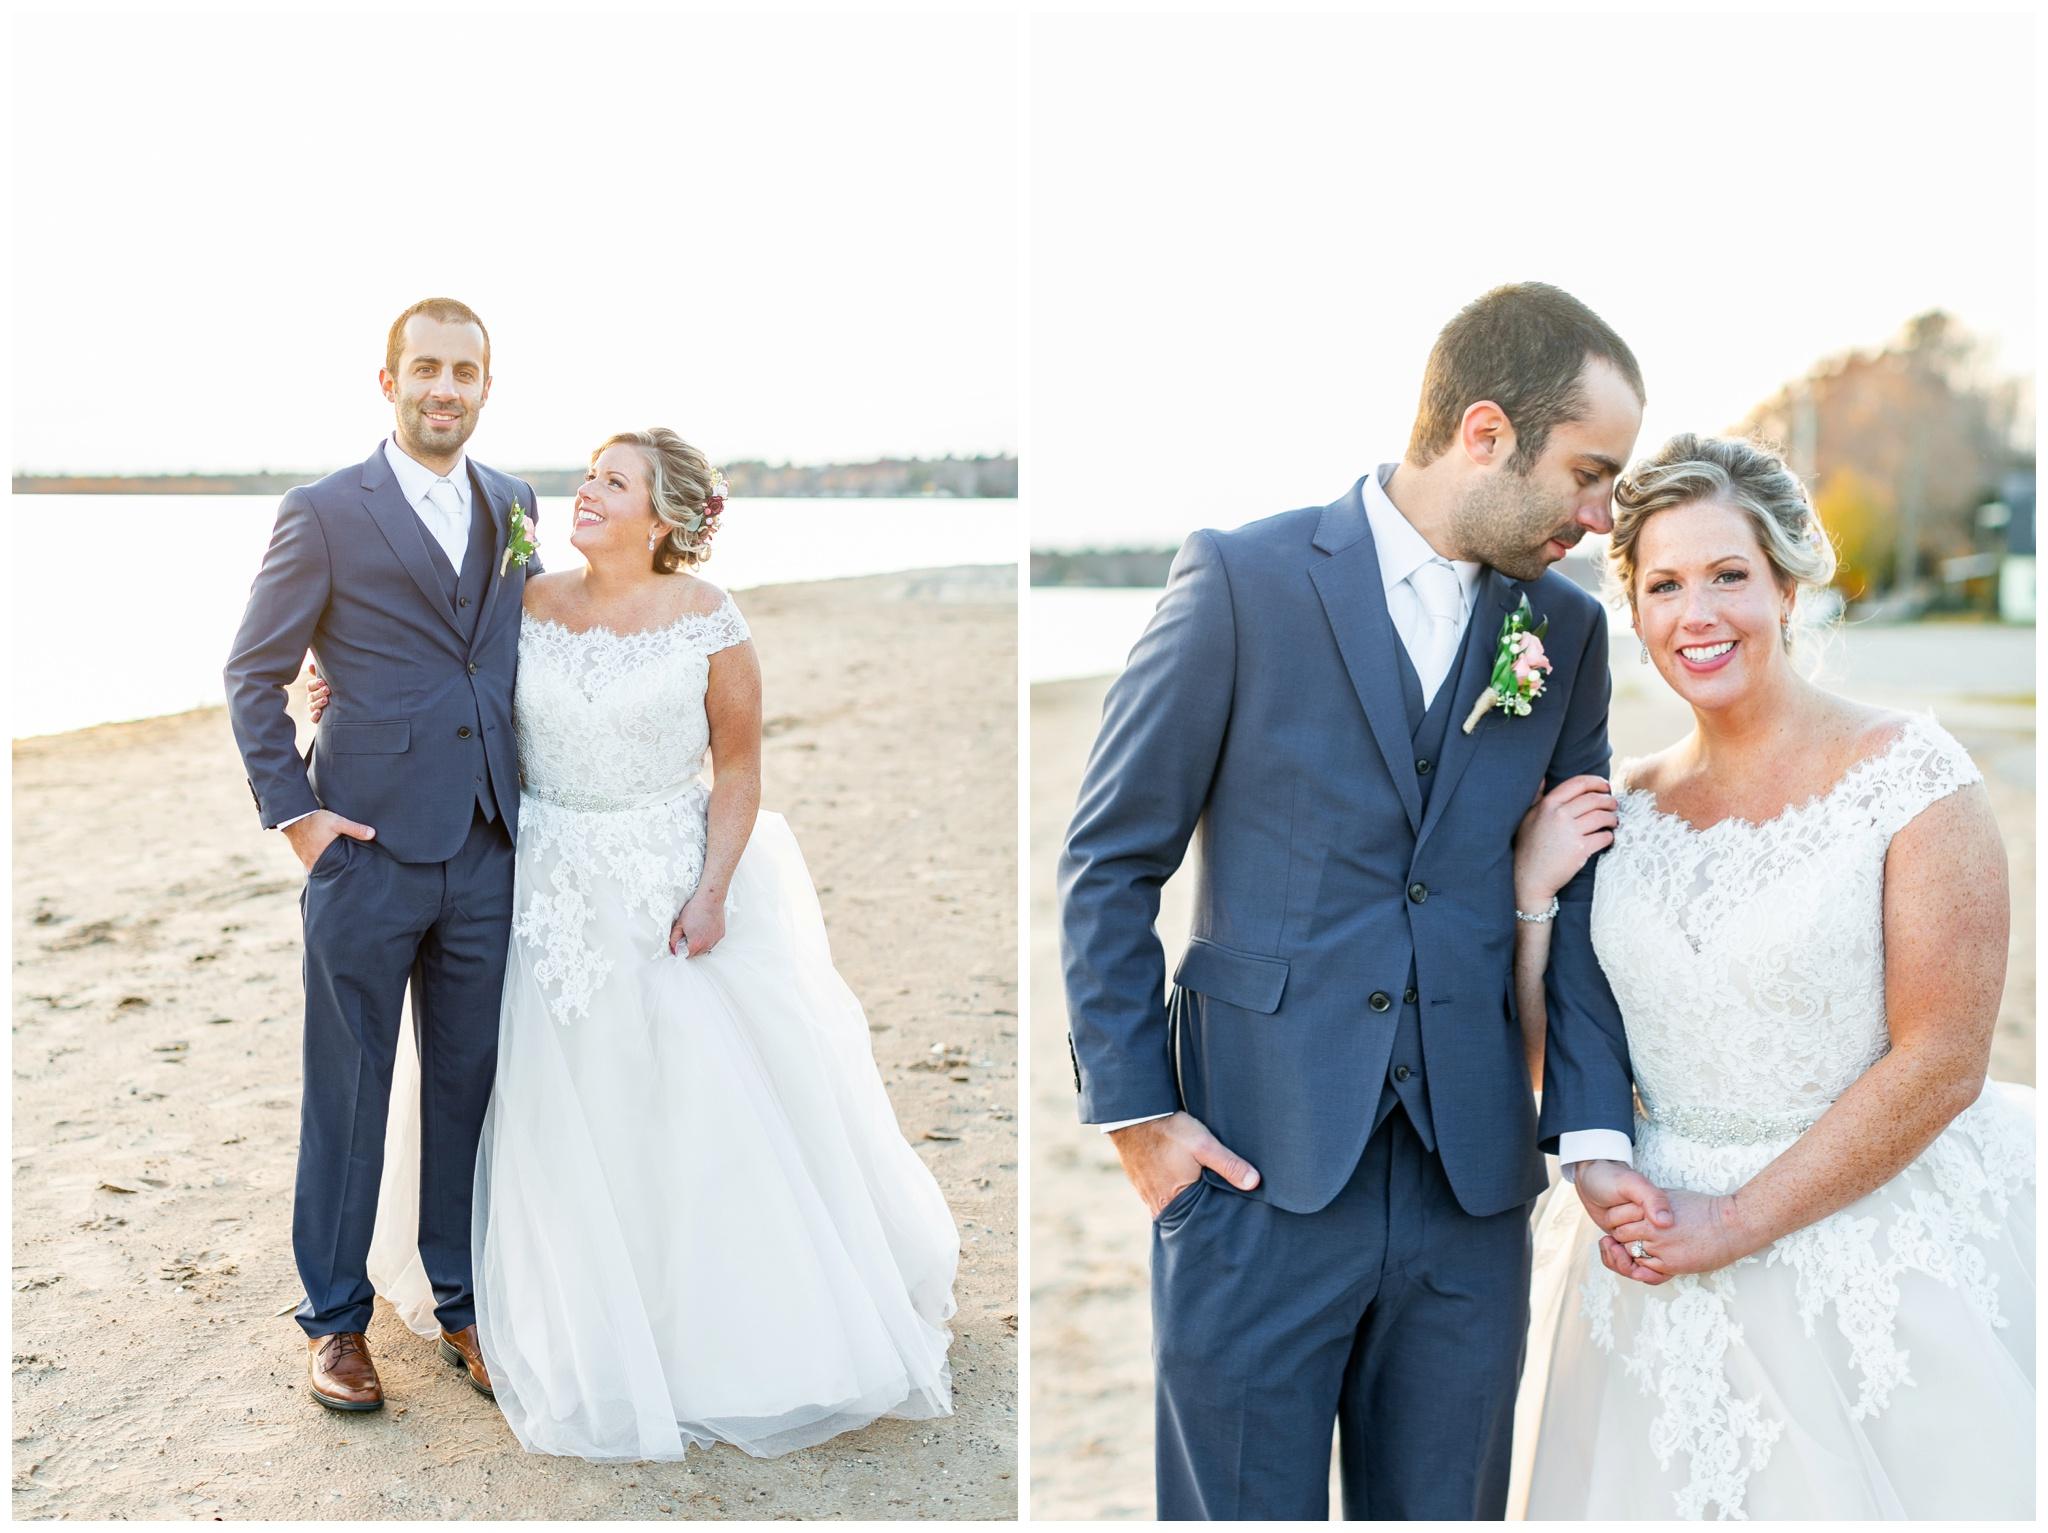 Shawano_County_park_Wedding_Caynay_Photo_Madison_Wi_2342.jpg